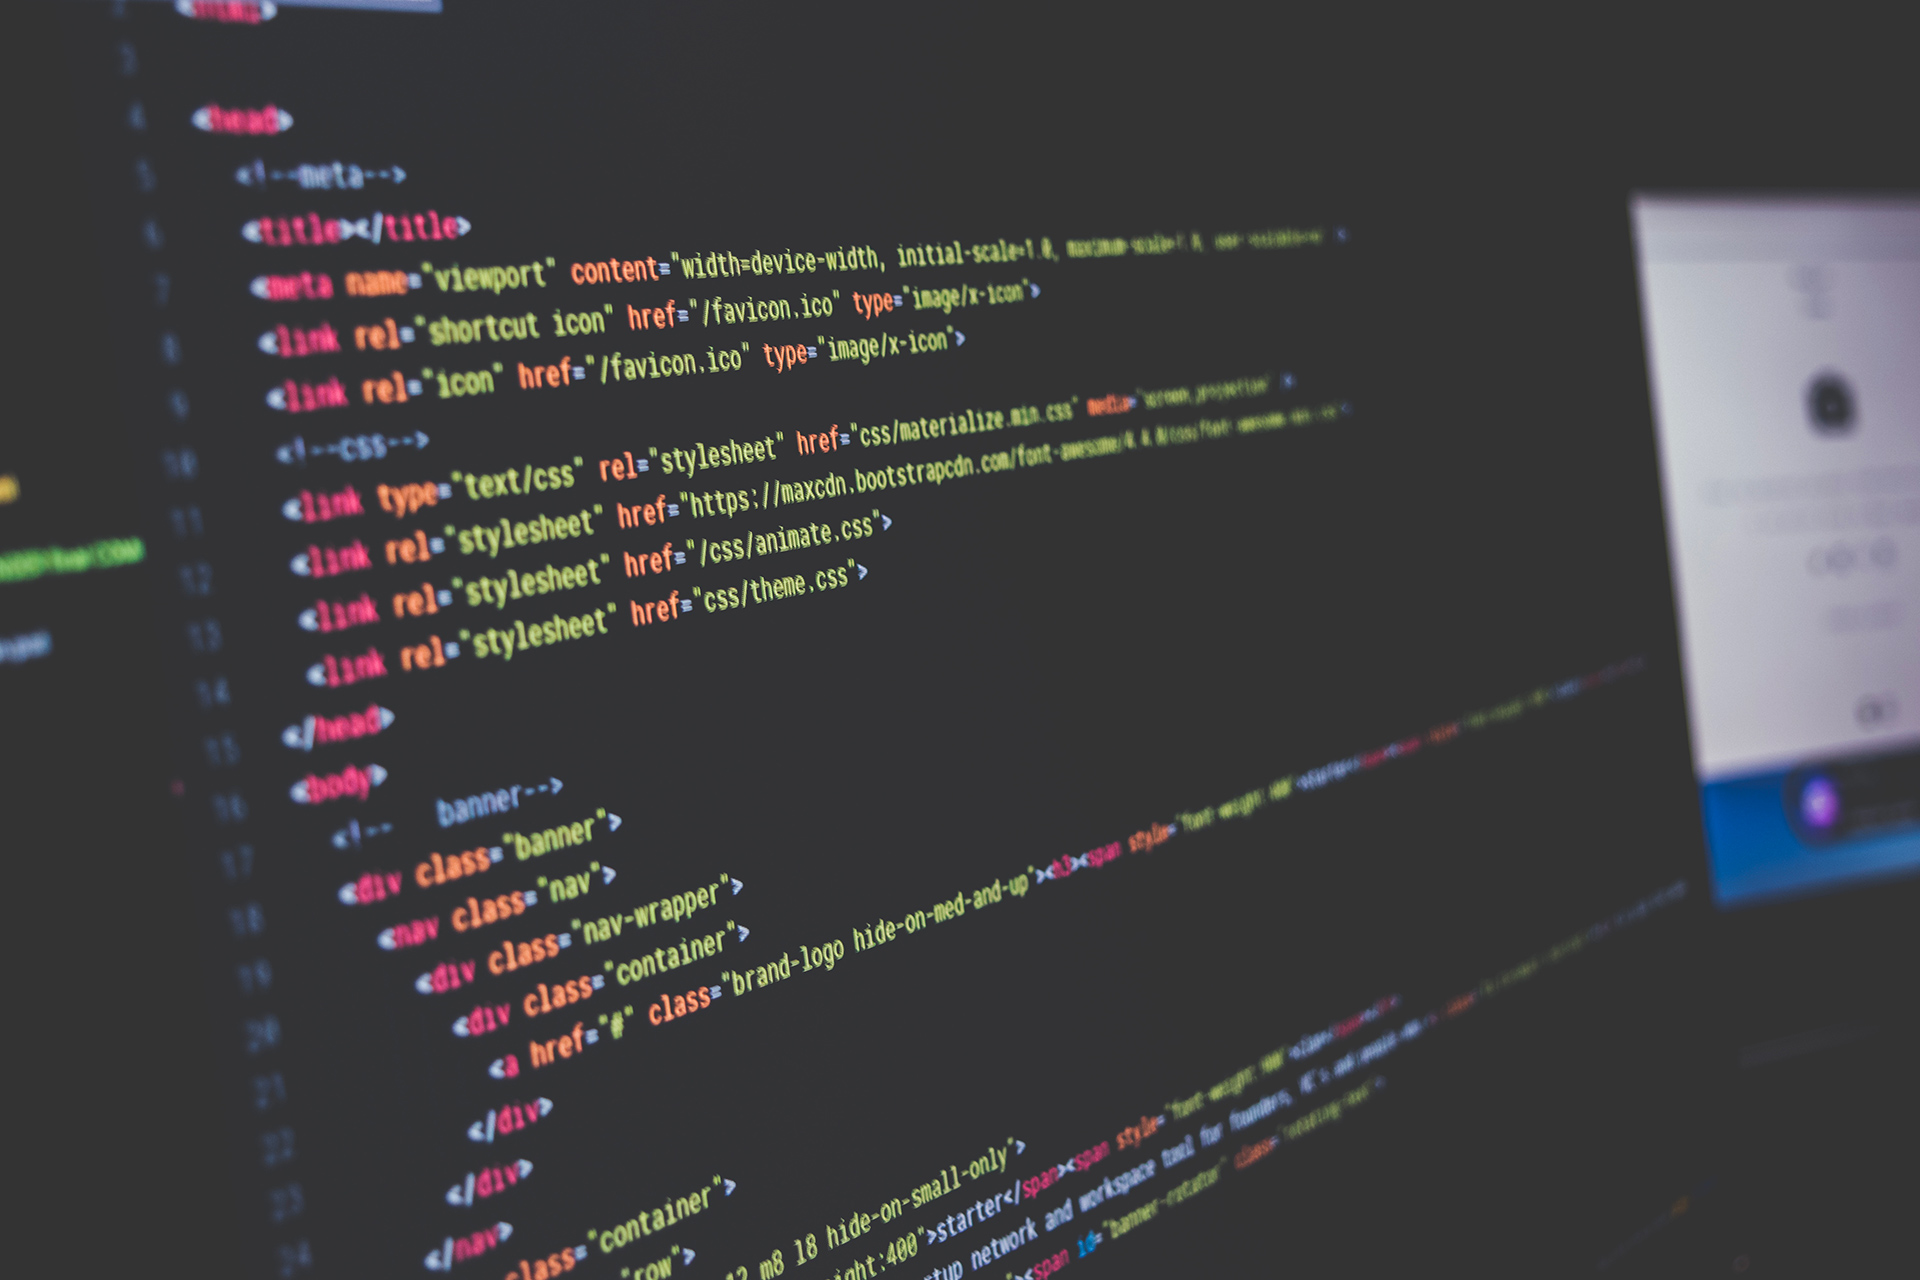 Le code html